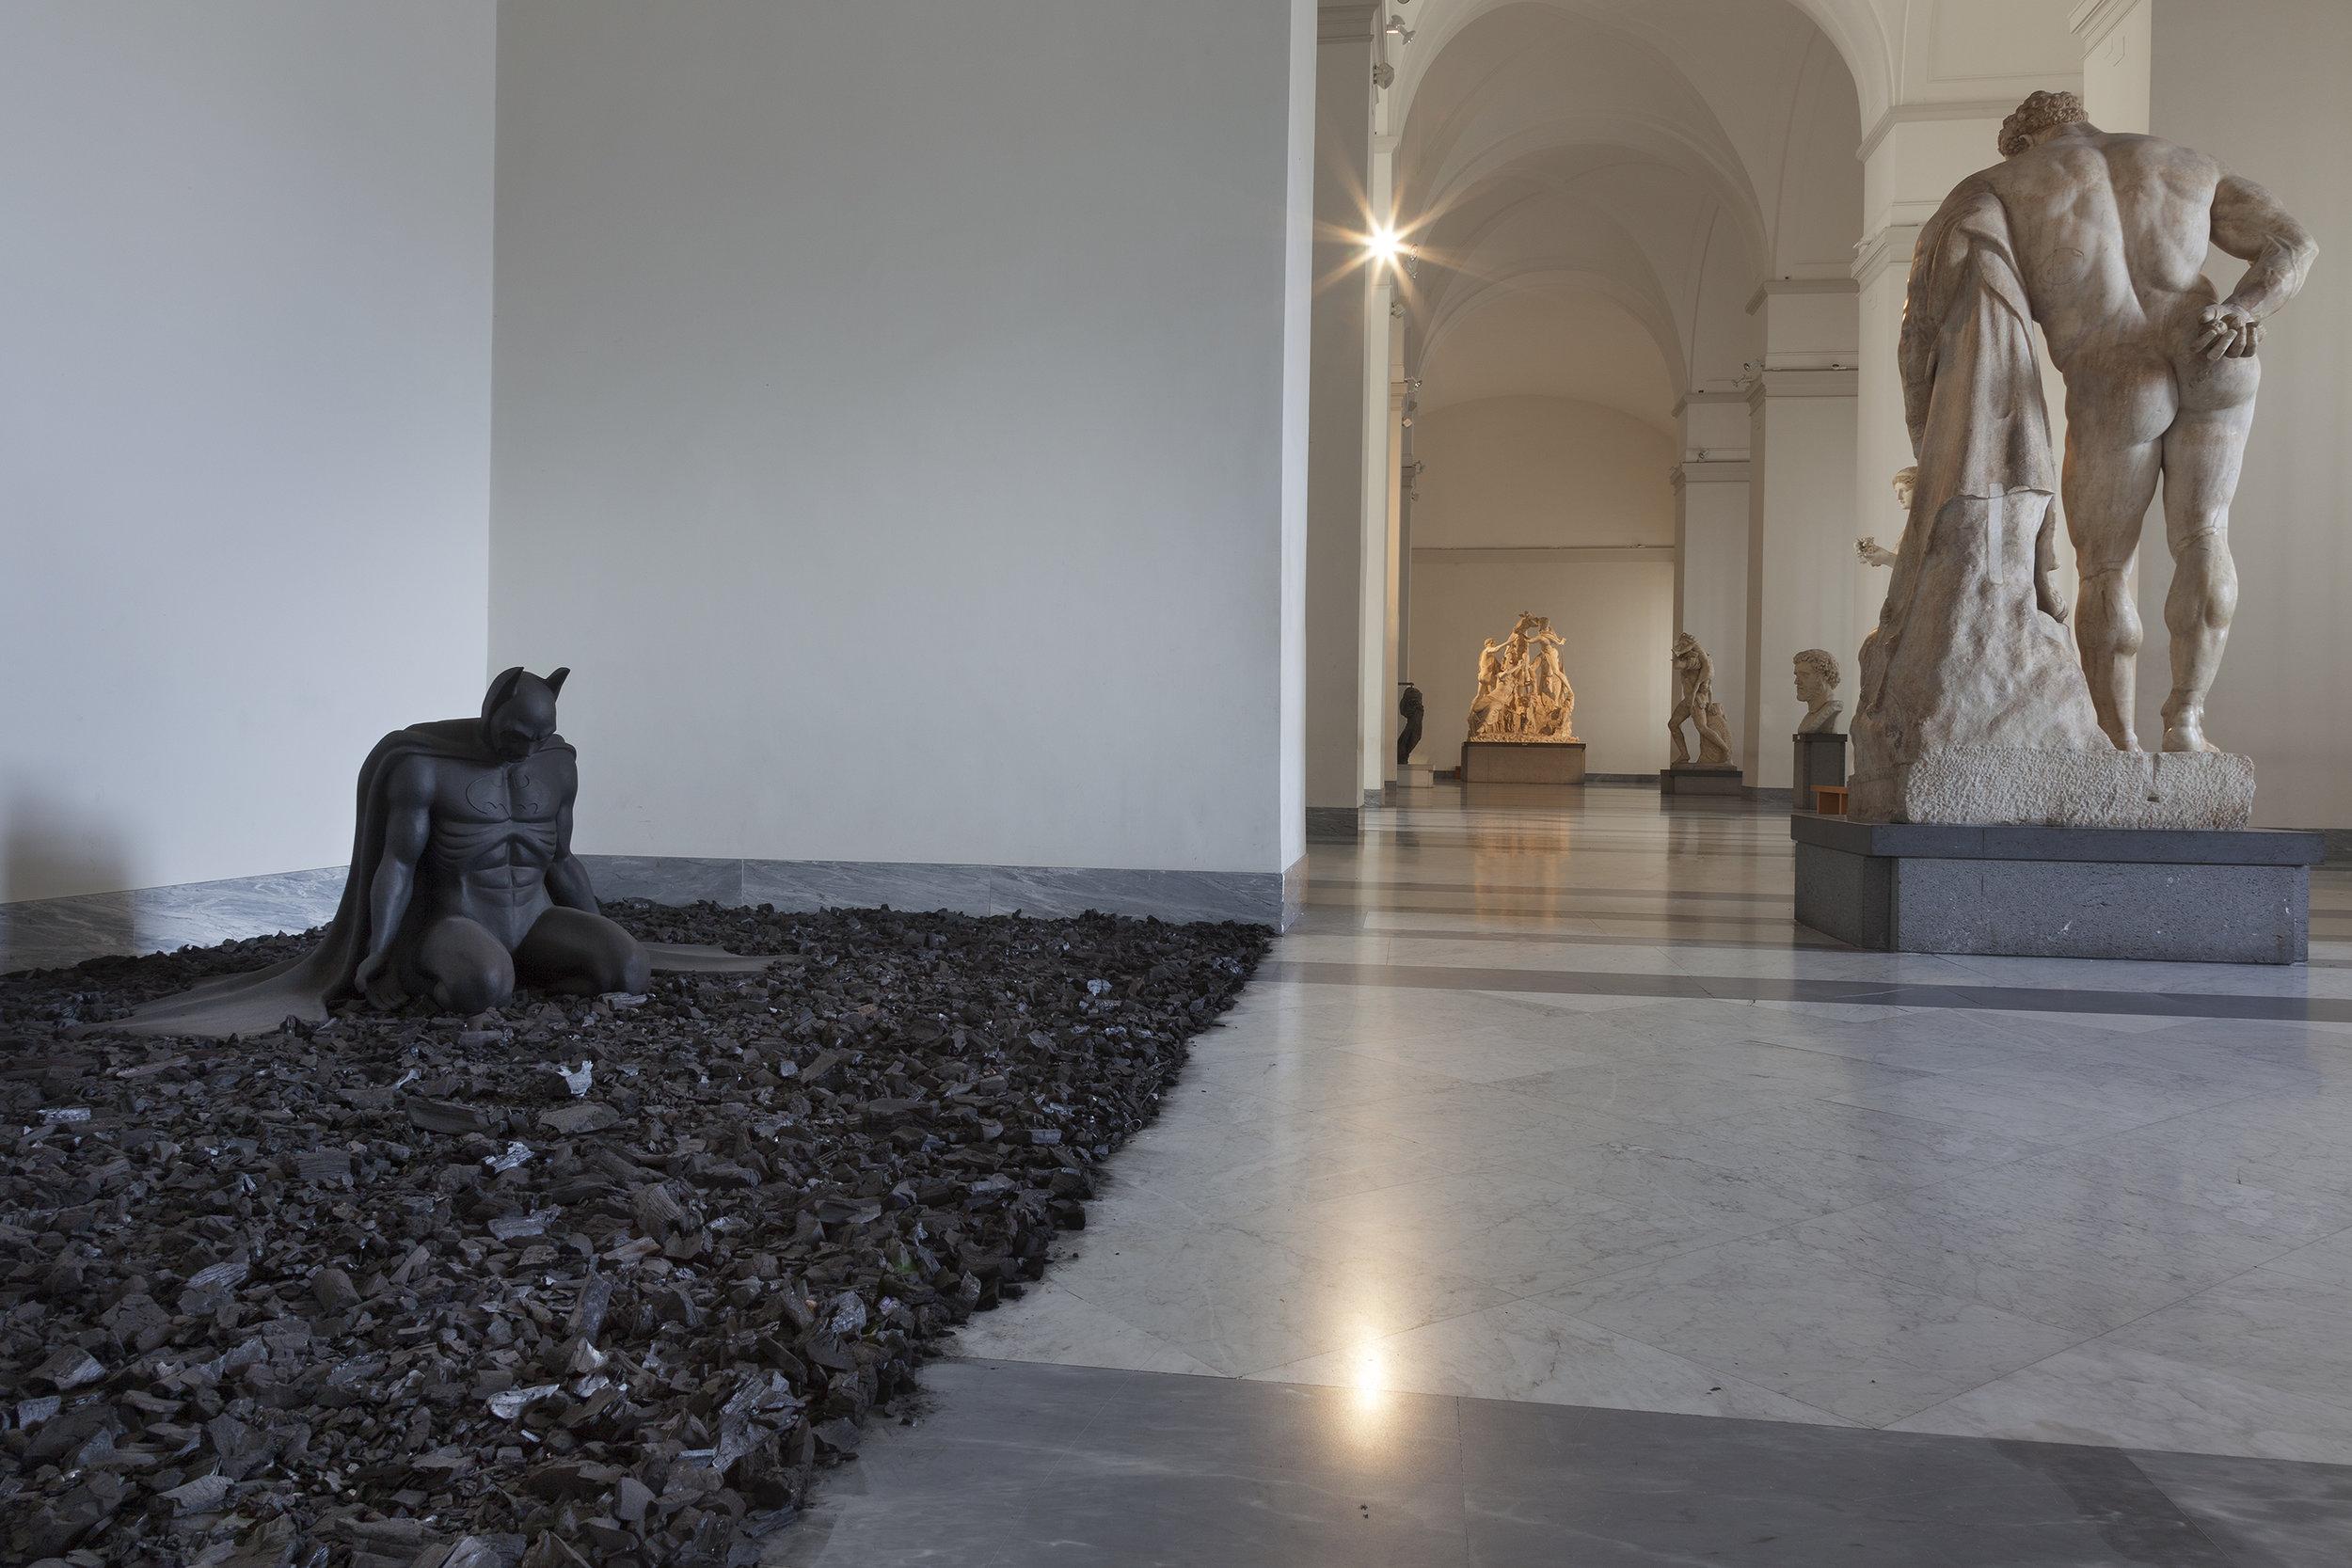 Back in Black , 2005 . MANN - Museo Archeologico Nazionale di Napoli, Naples 2016. Installation view. Photo: Claudio Abate